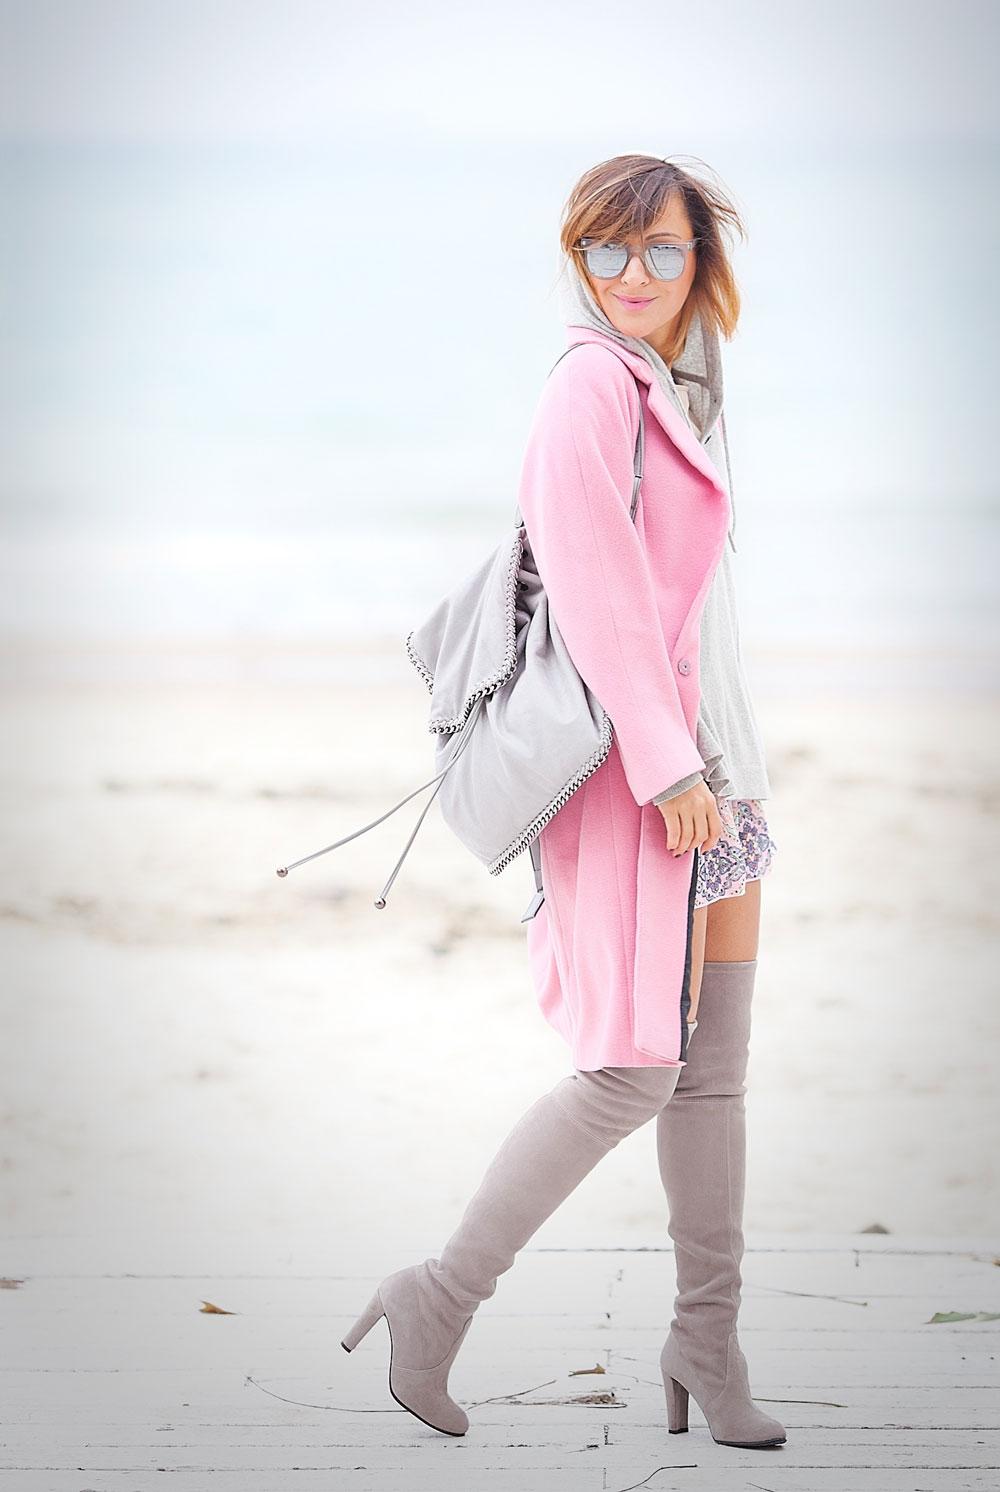 stella+mccartney+falabella+backpack-stuart+weitzman+highland+boots+outfit